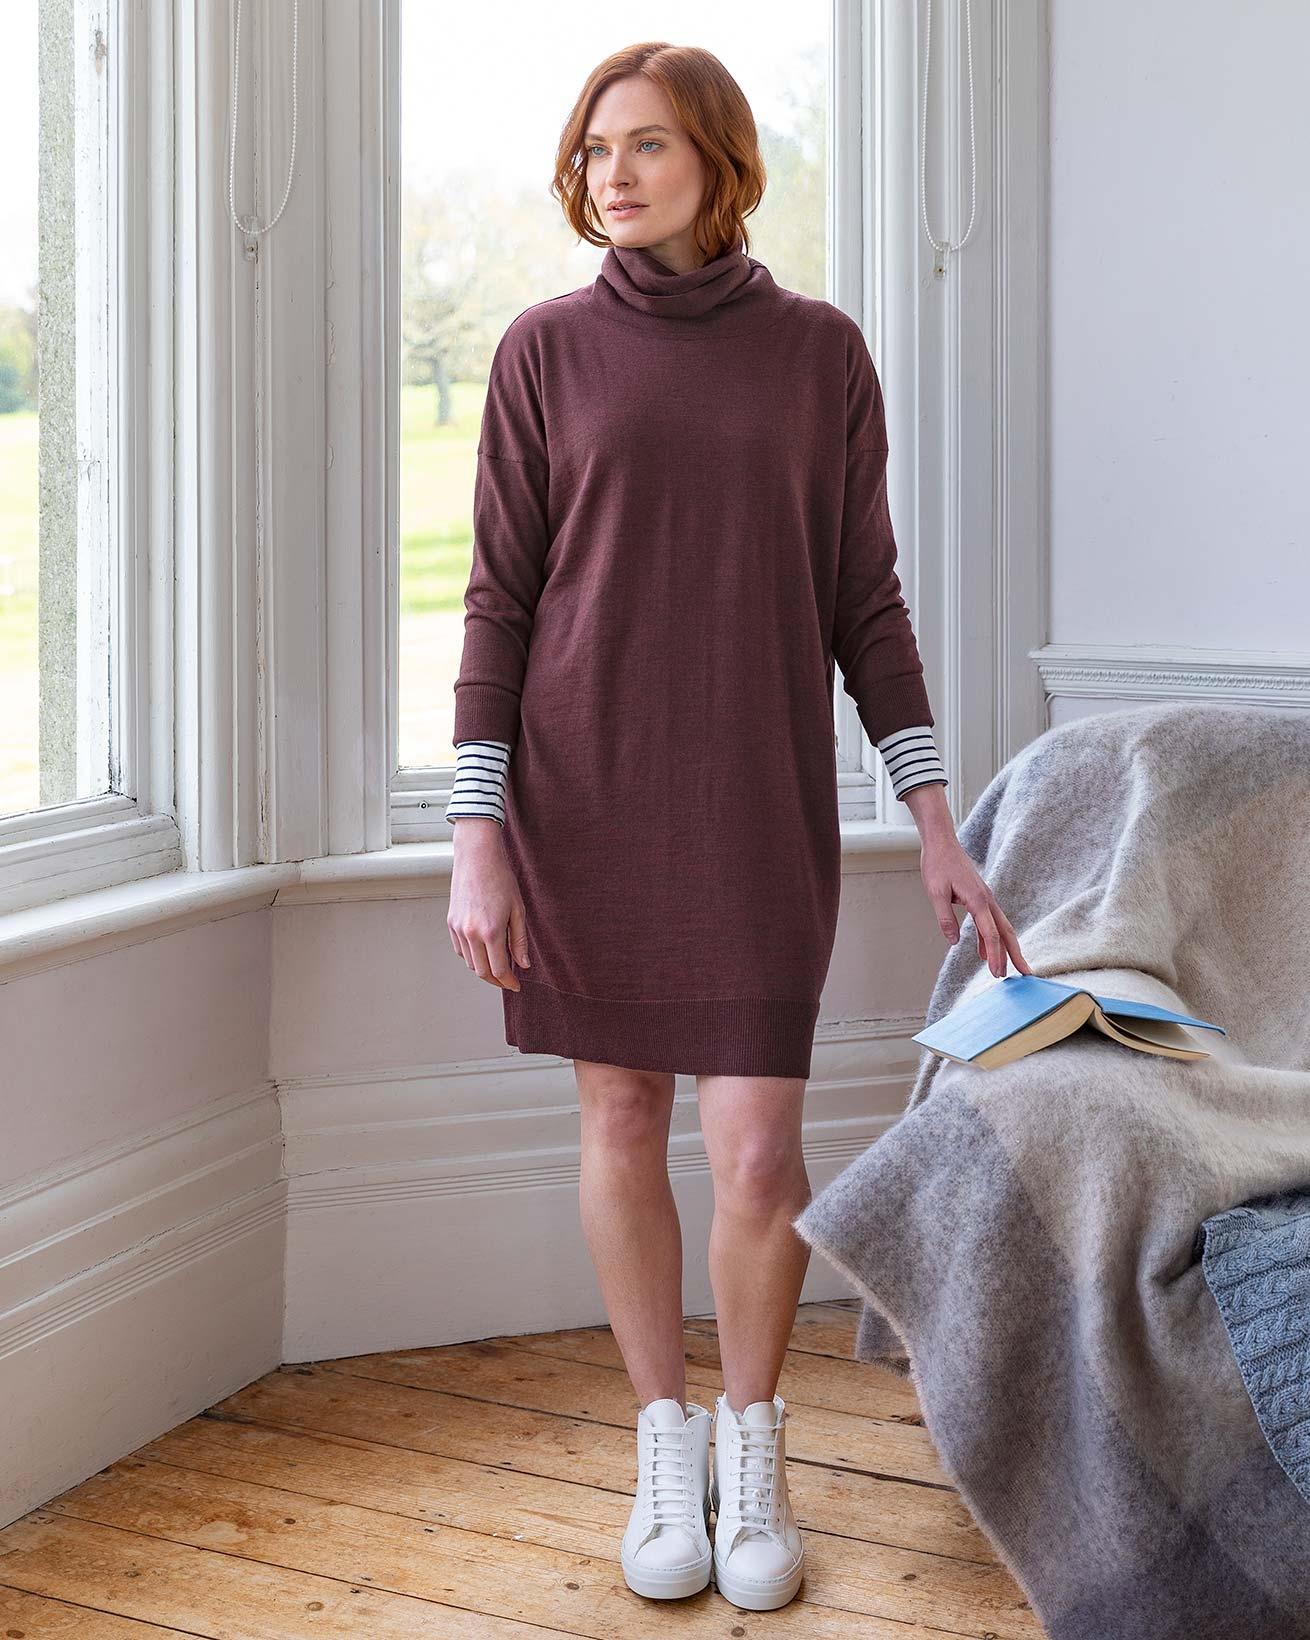 7515_slouchy-fine-knit-rollneck-dress_damson_026_web.jpg